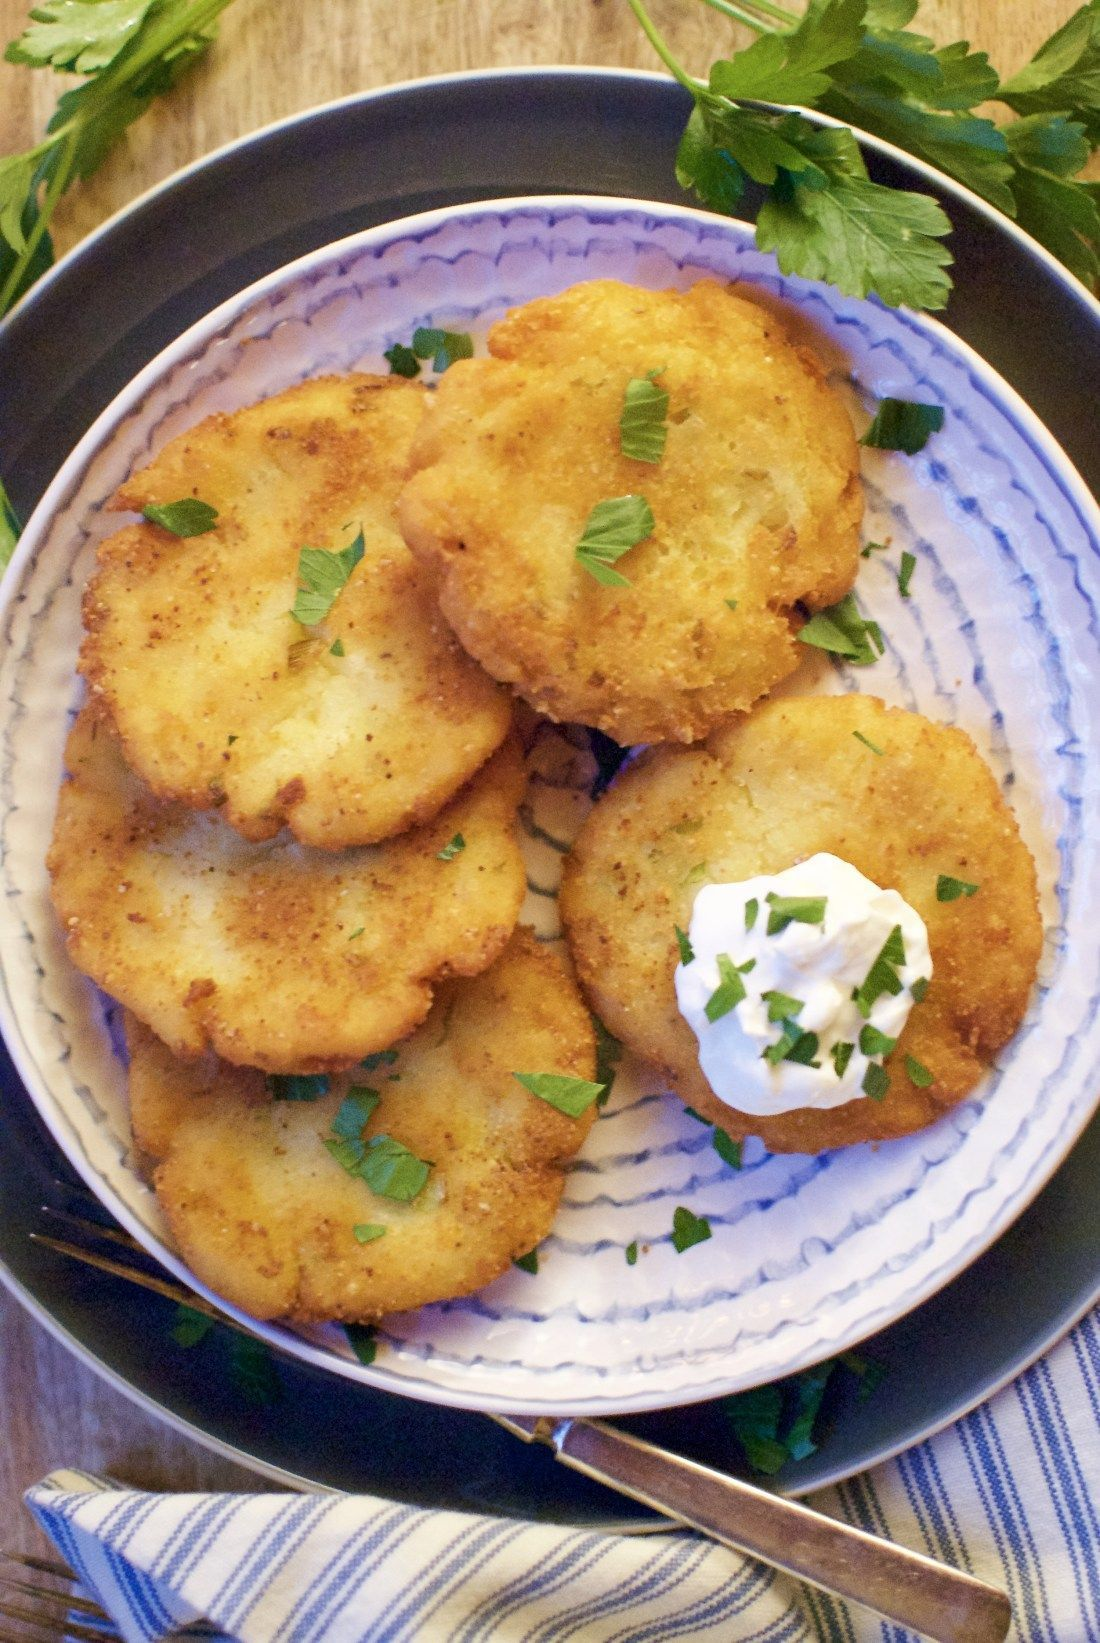 Gluten-free mashed potato pancakes #potatopancakesfrommashedpotatoes gluten-free potato pancakes #potatopancakesfrommashedpotatoes